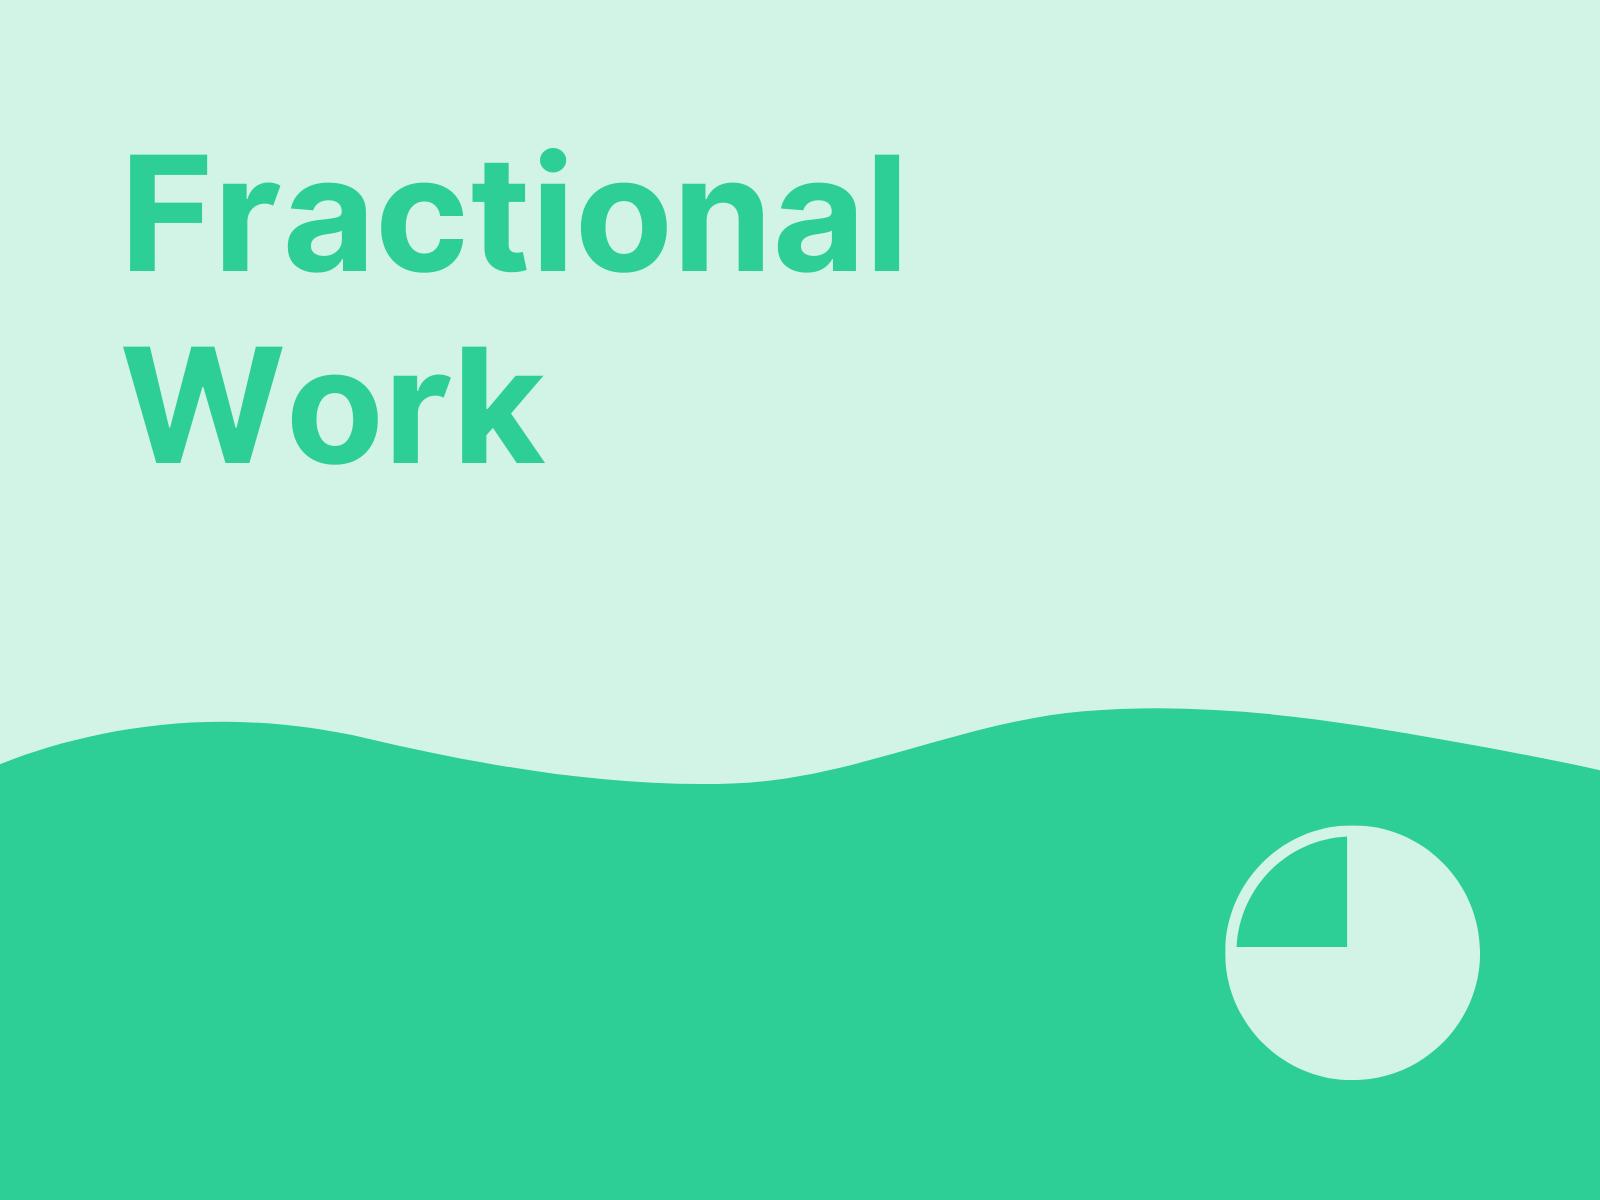 Fractional work